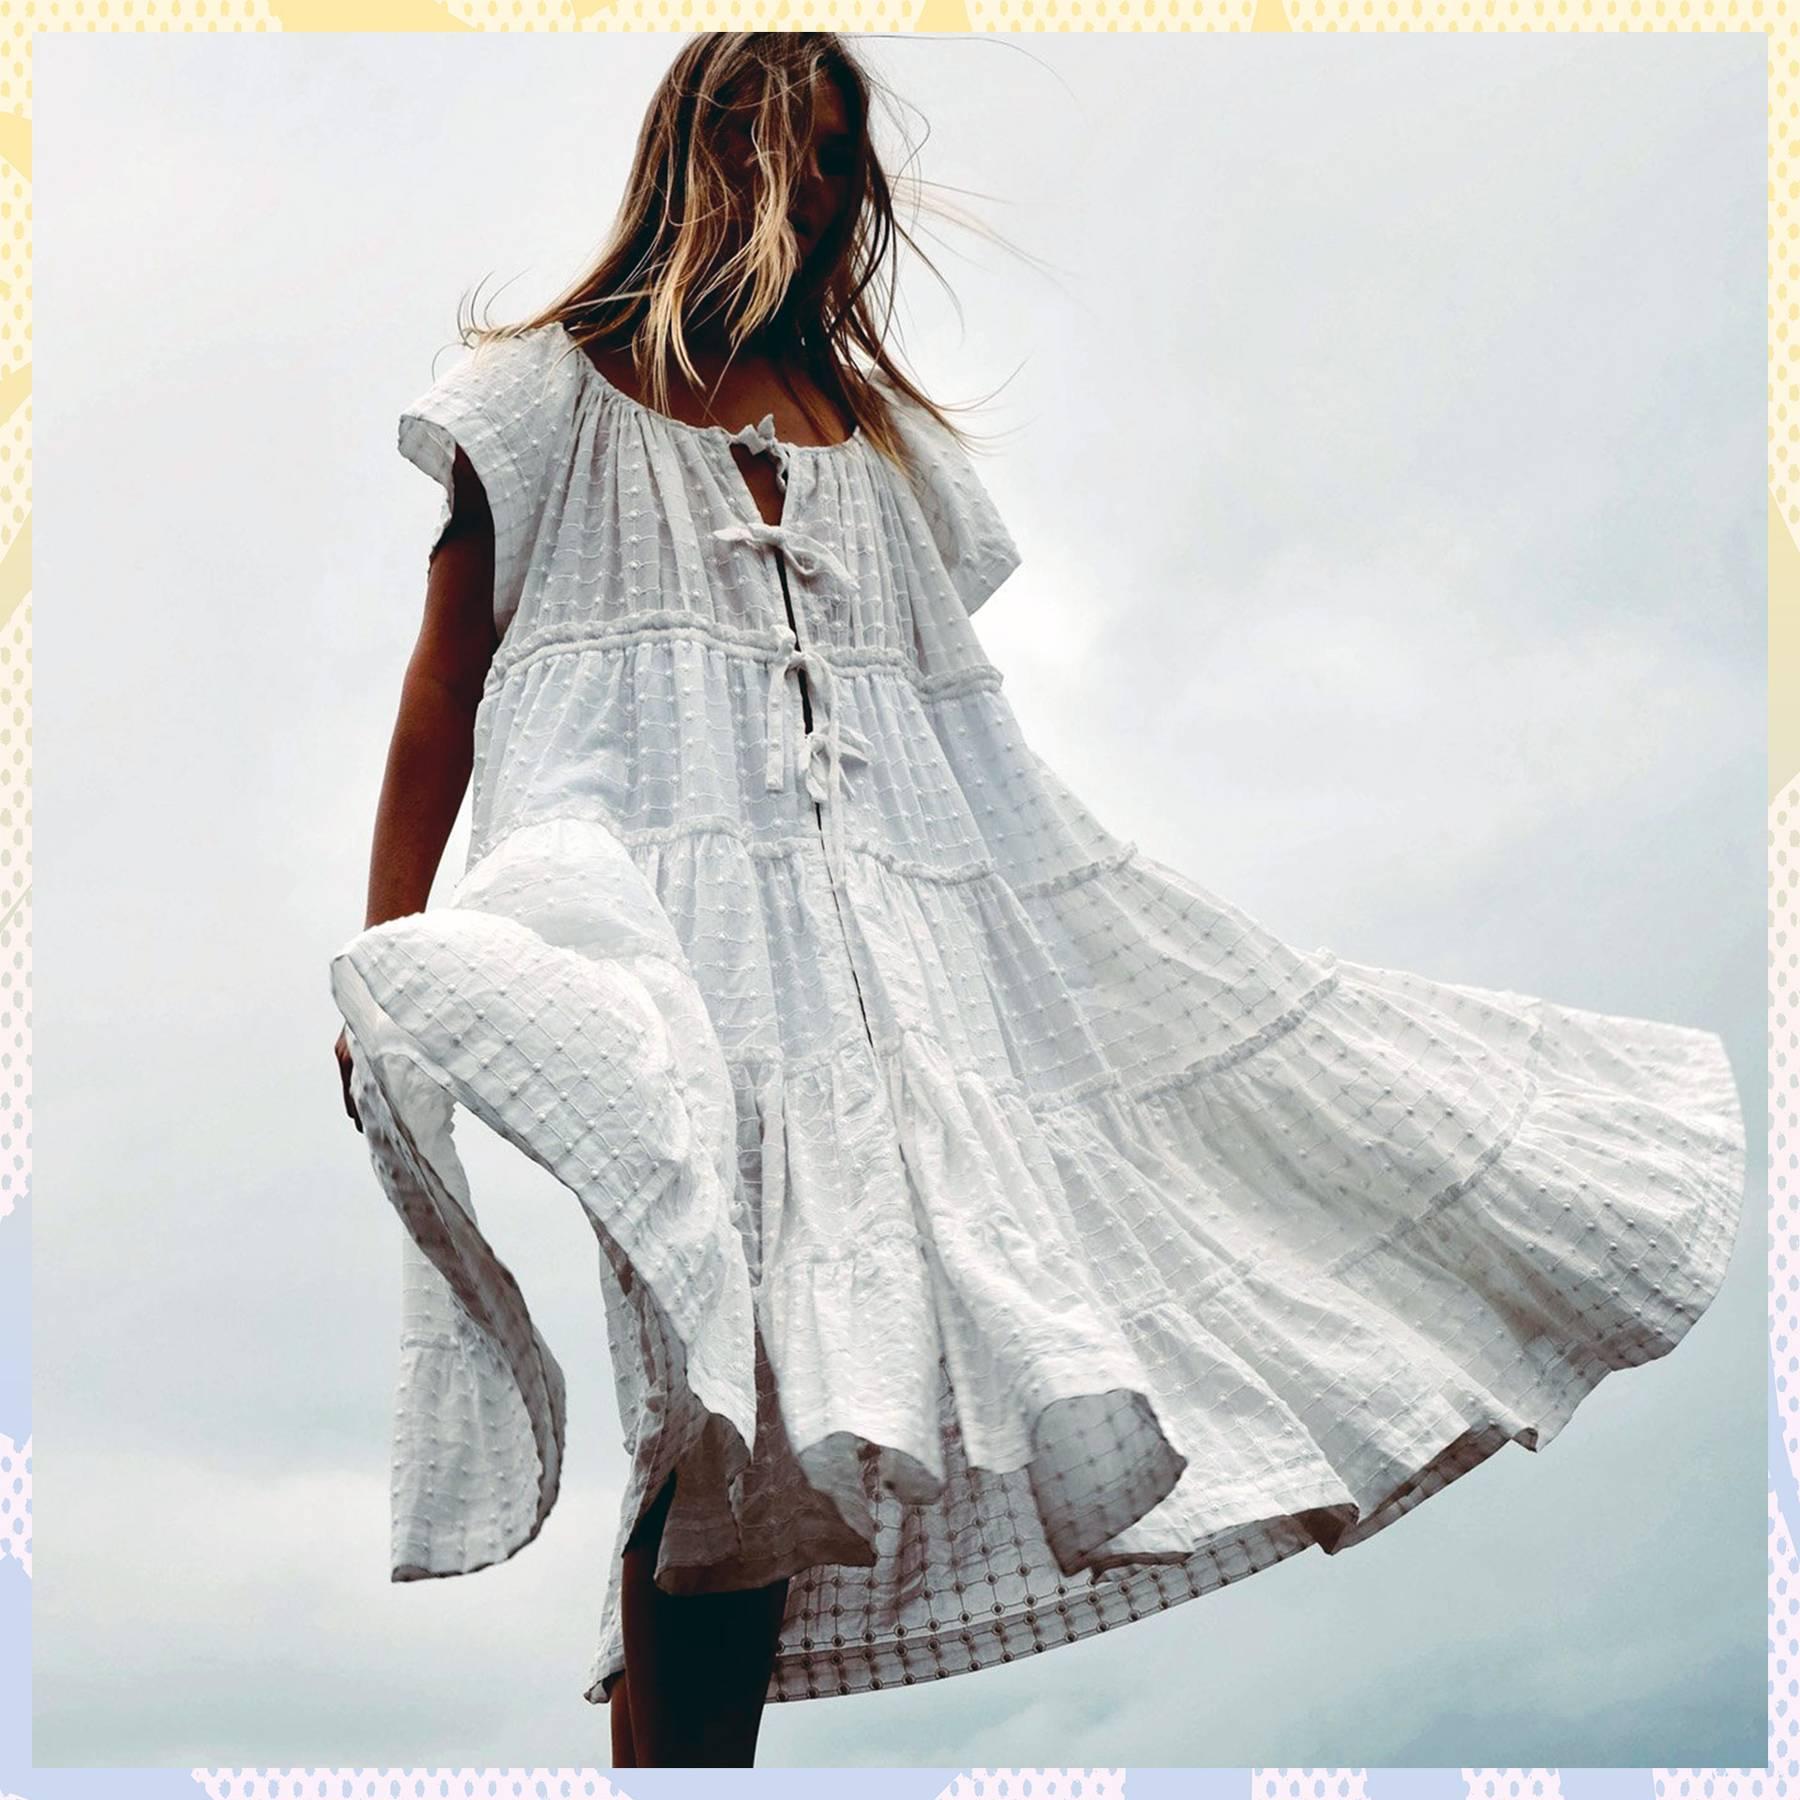 e74b3a5bda Summer dresses 2019 UK - Midi